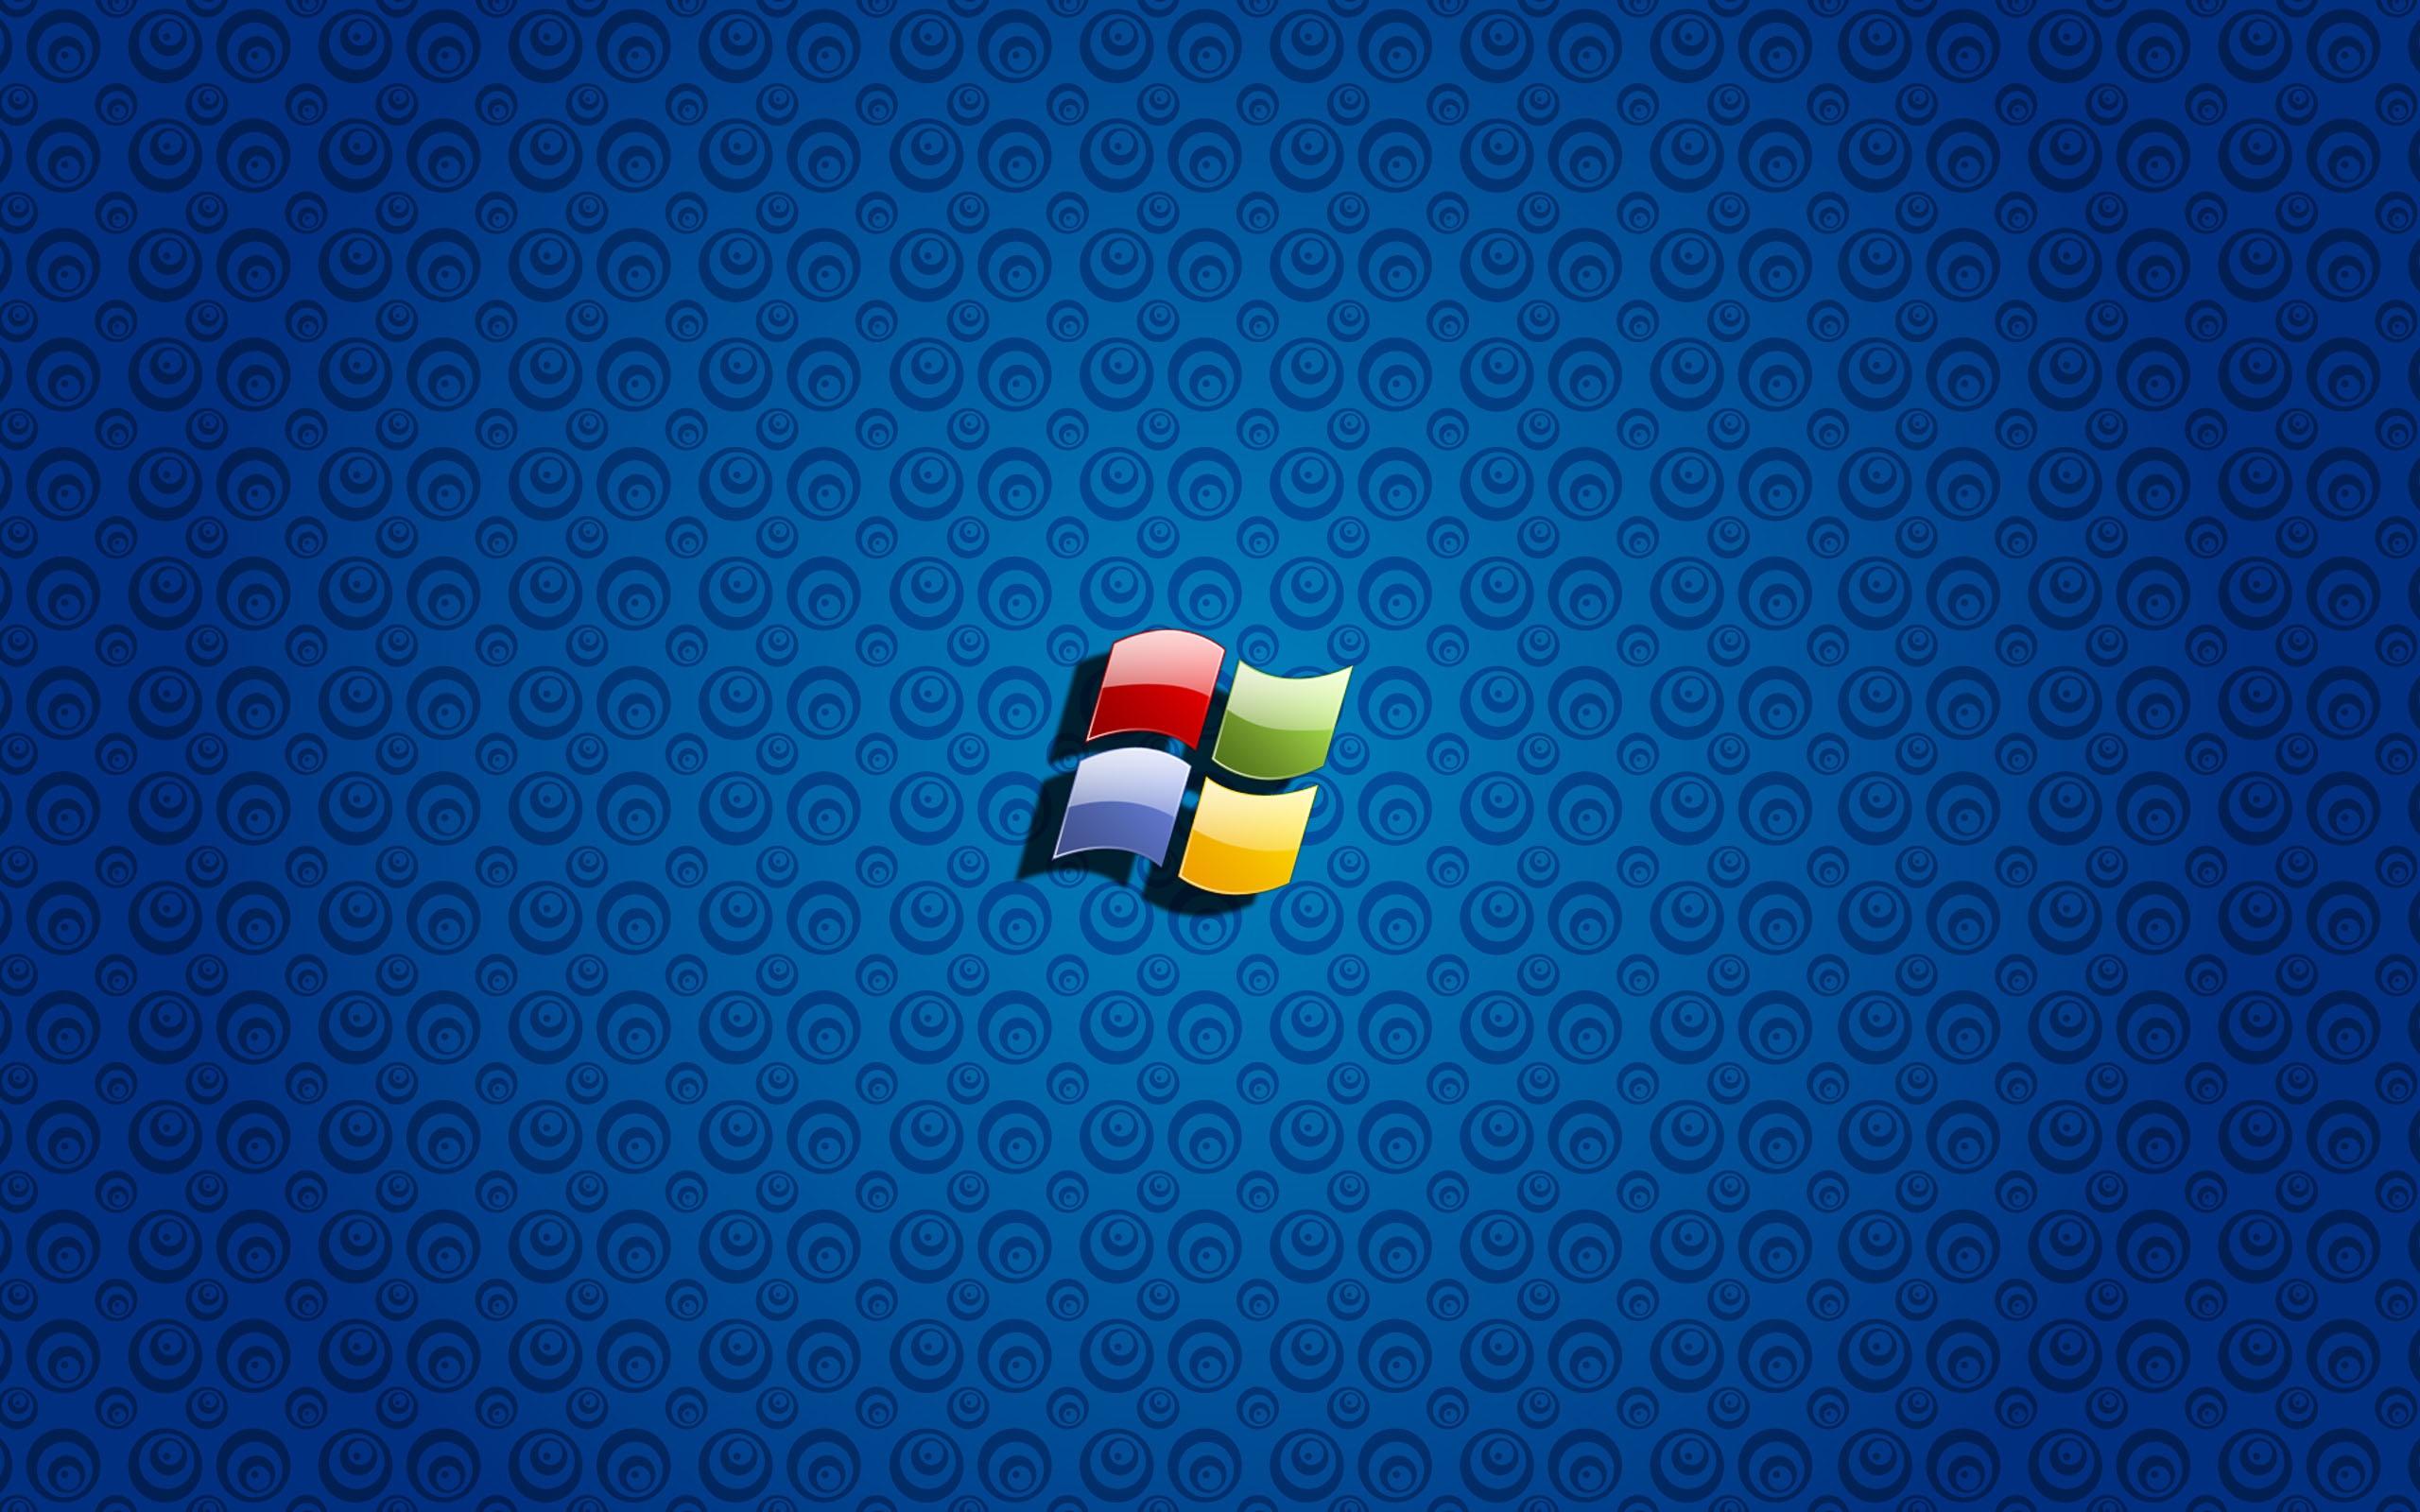 Windows Hd 1080p 8986 Hd Wallpaper